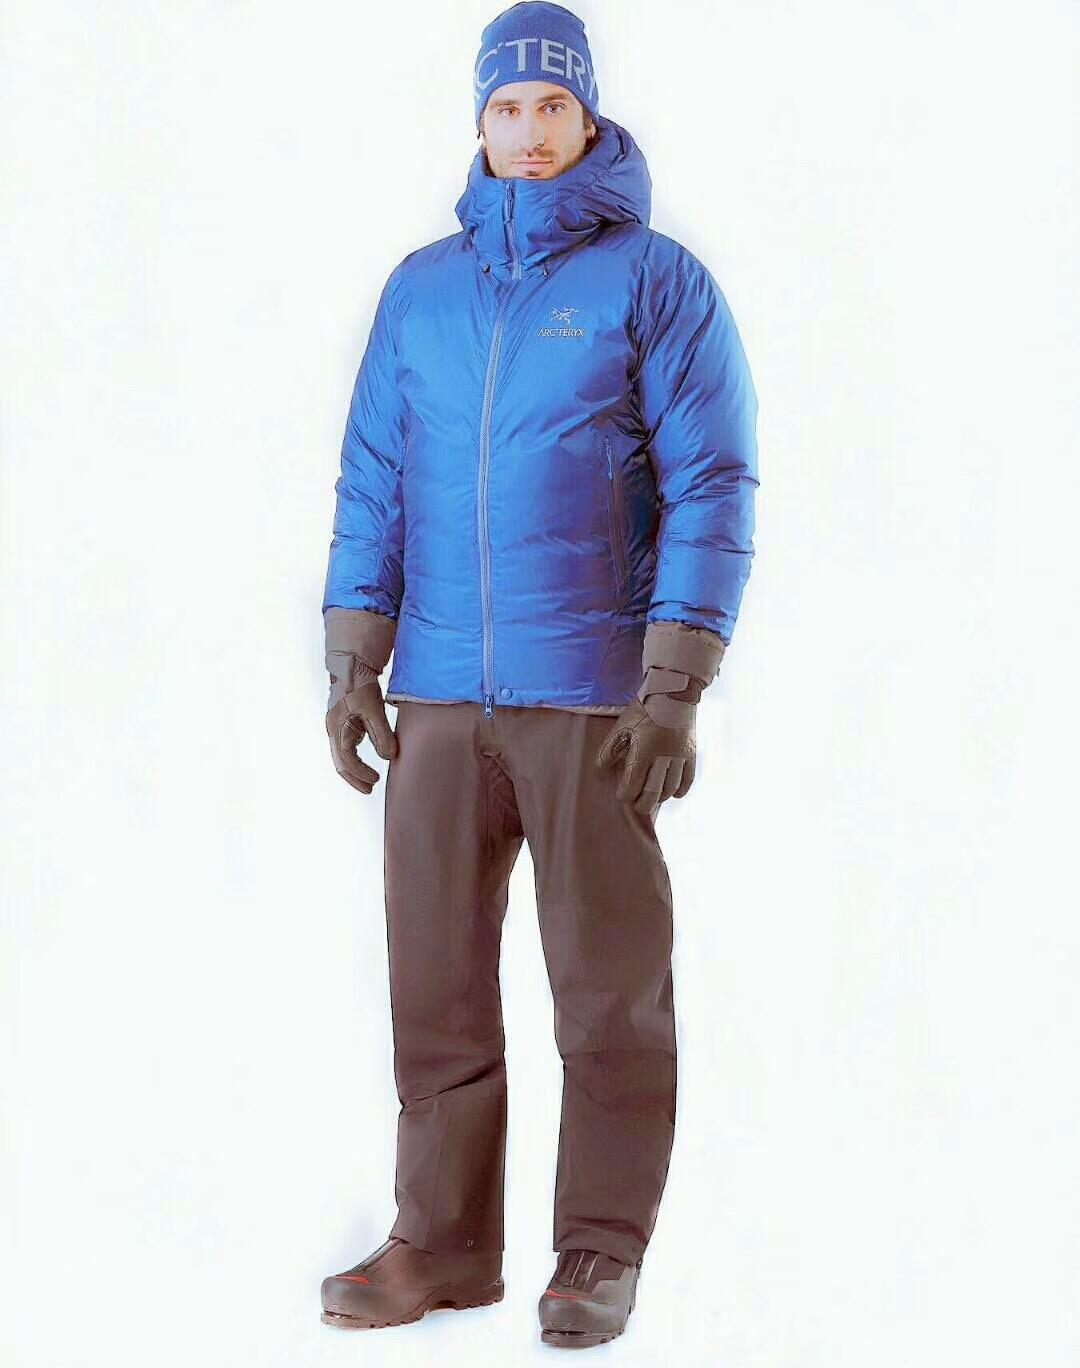 MB8011070,鸟FIREBEE AR PARKA 鹅绒大衣滑雪服,款号:18016